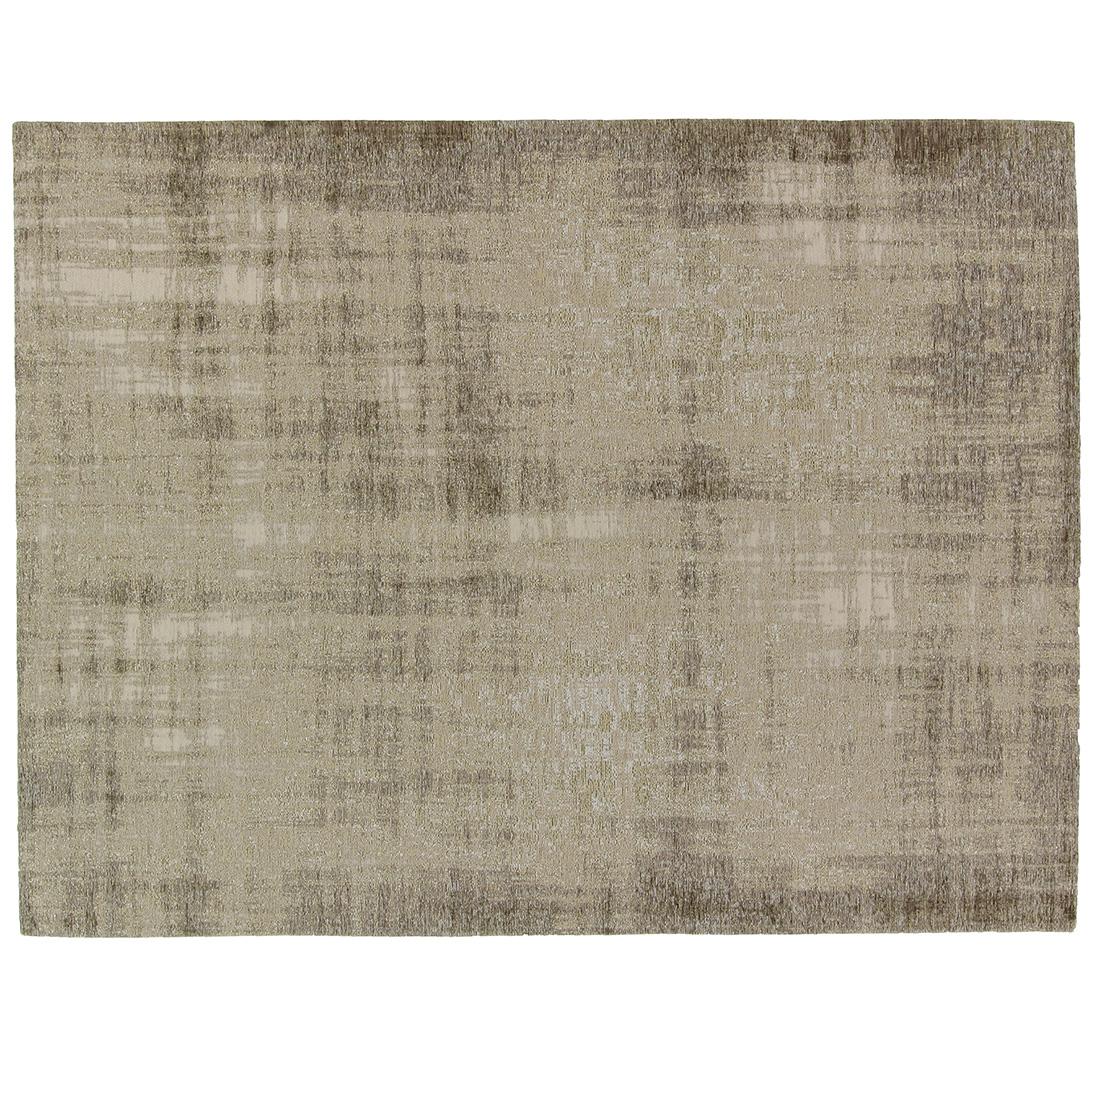 Vloerkleed Brinker Grunge Beige | 200 x 300 cm